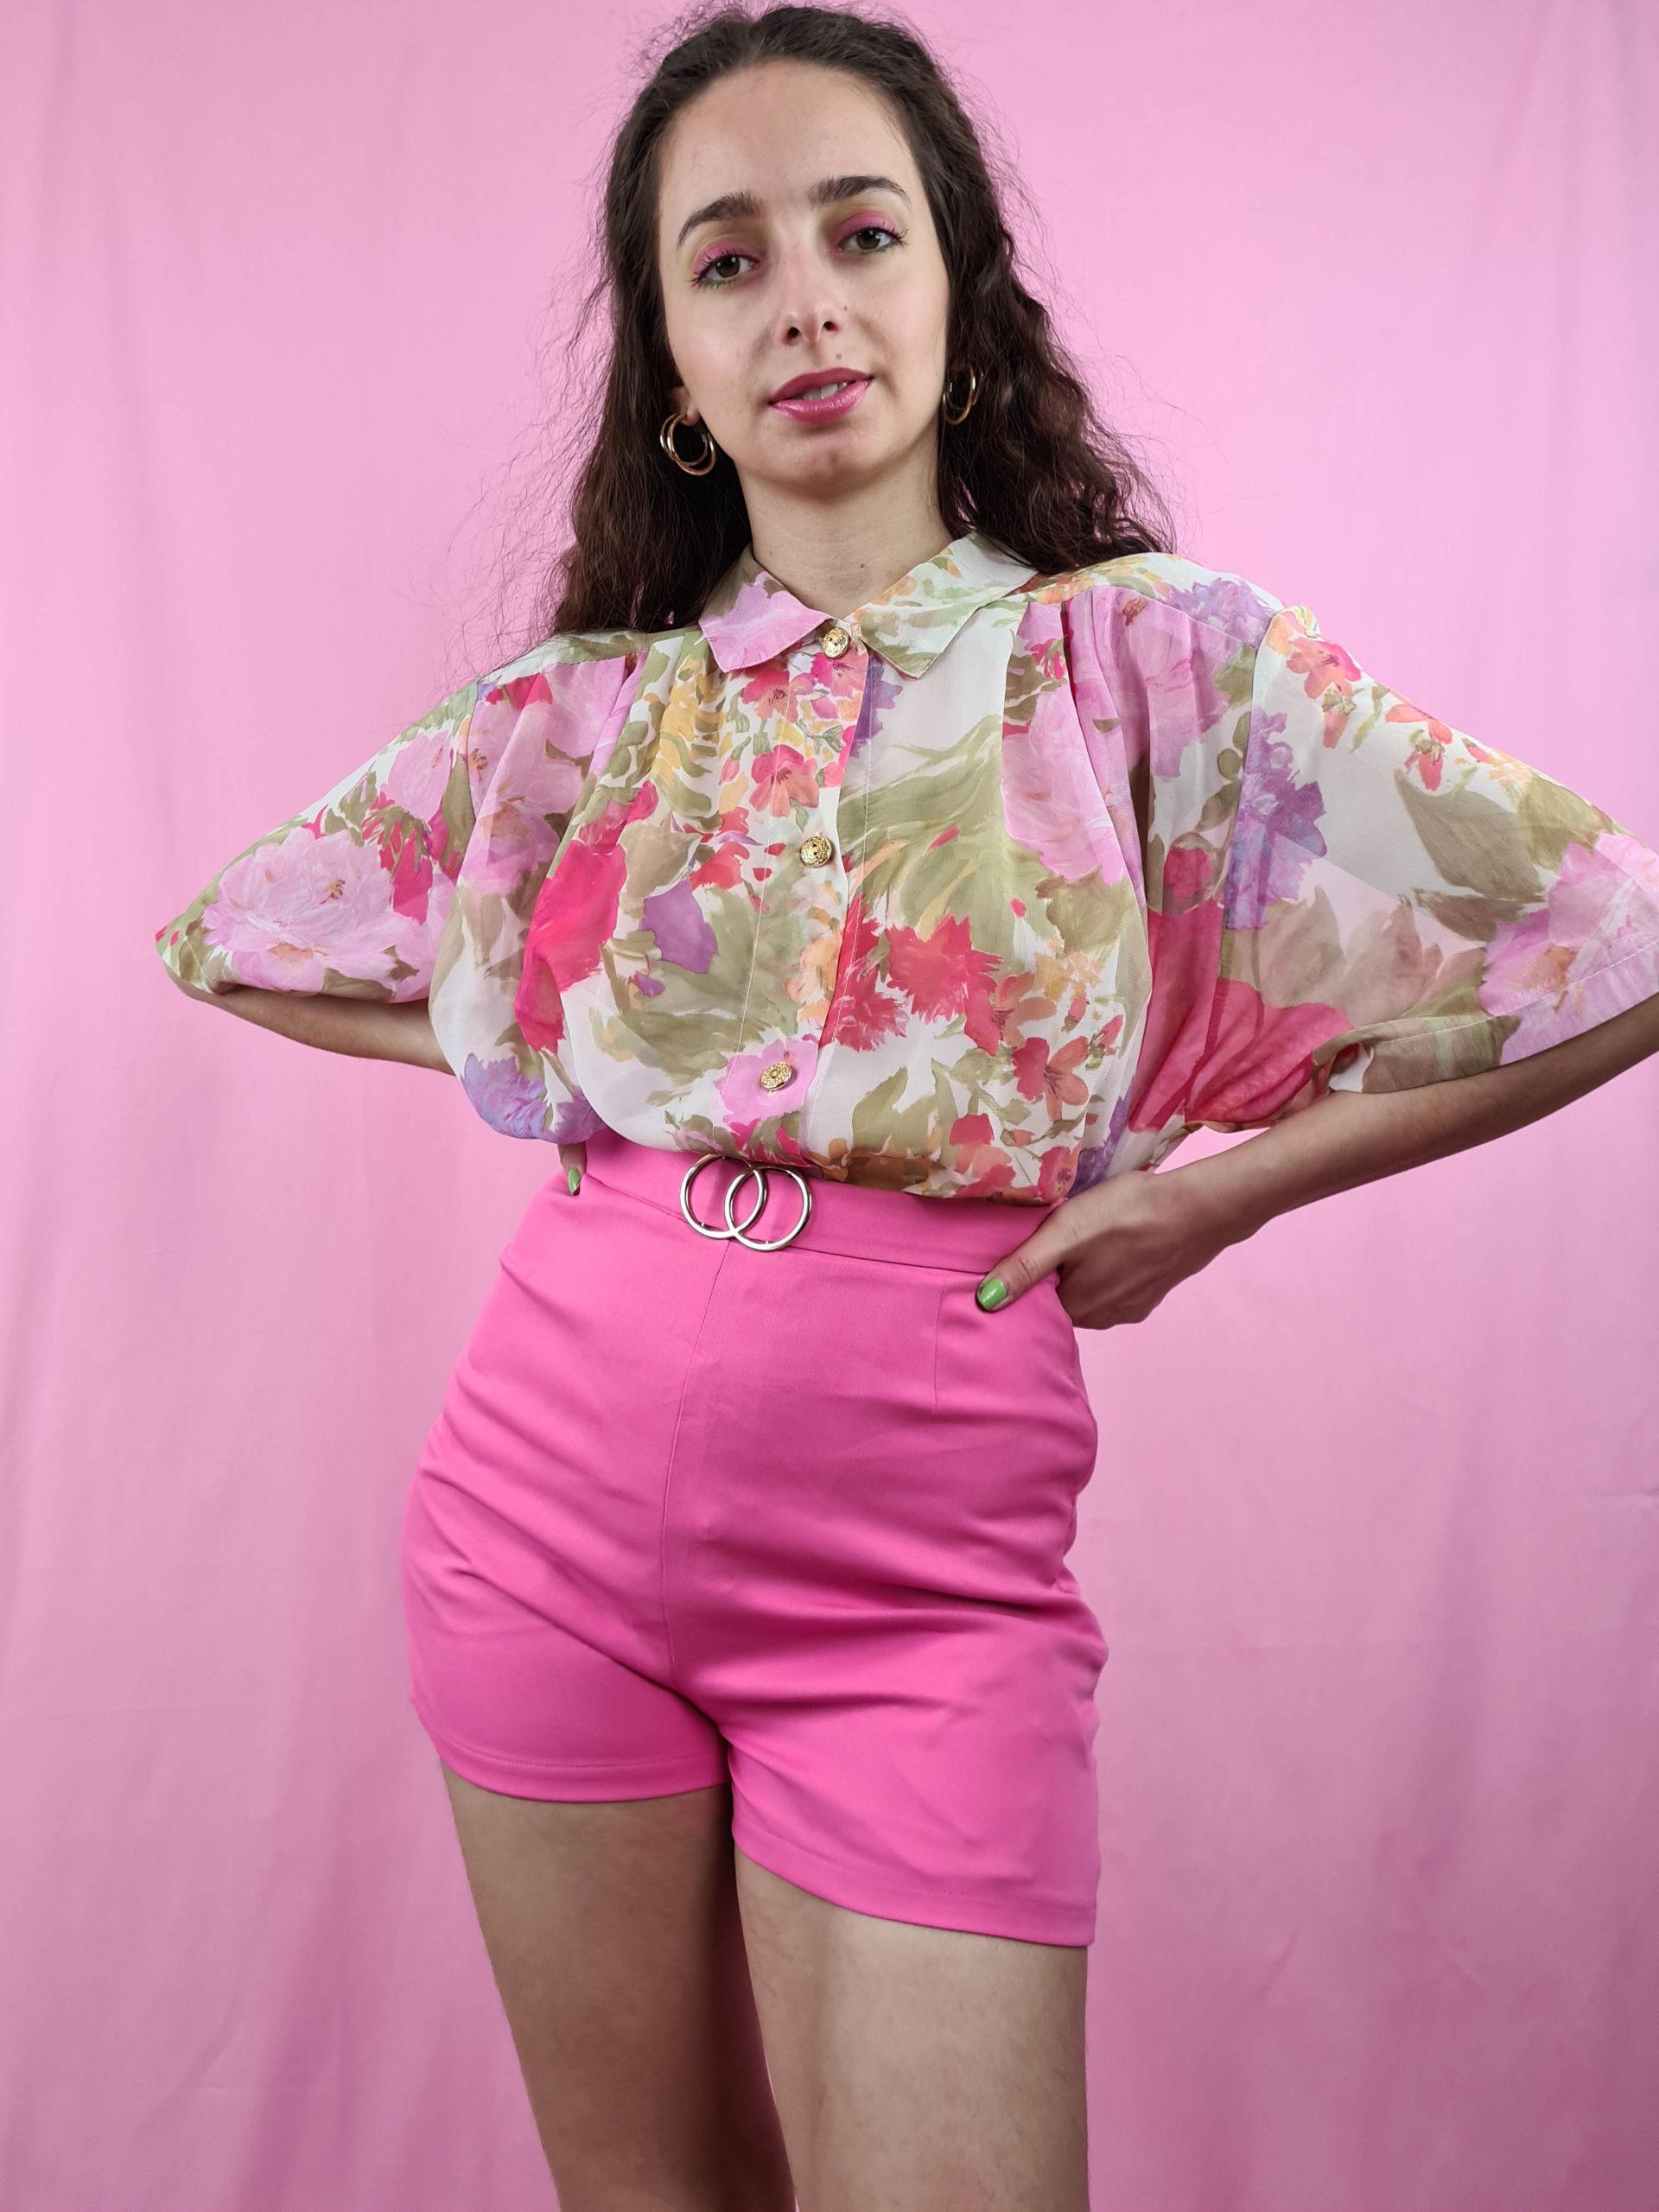 chemise fleurie transparente (3)